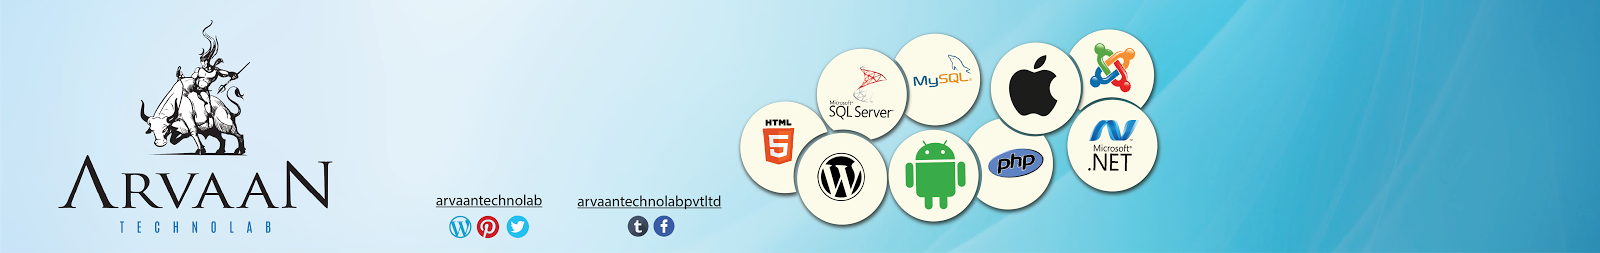 Mobile App Development, Ecommerce Development Service